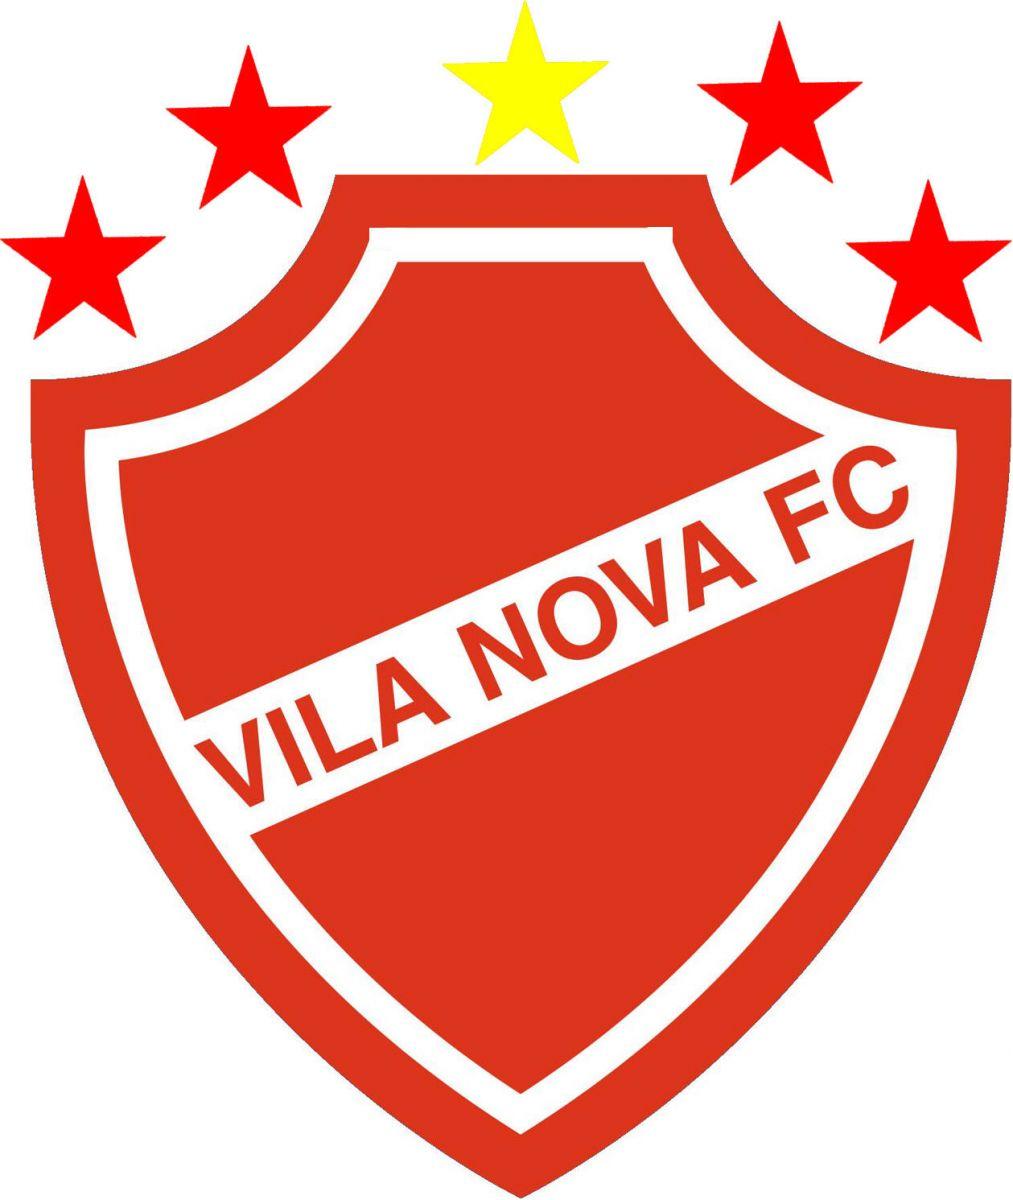 Vila Nova GO